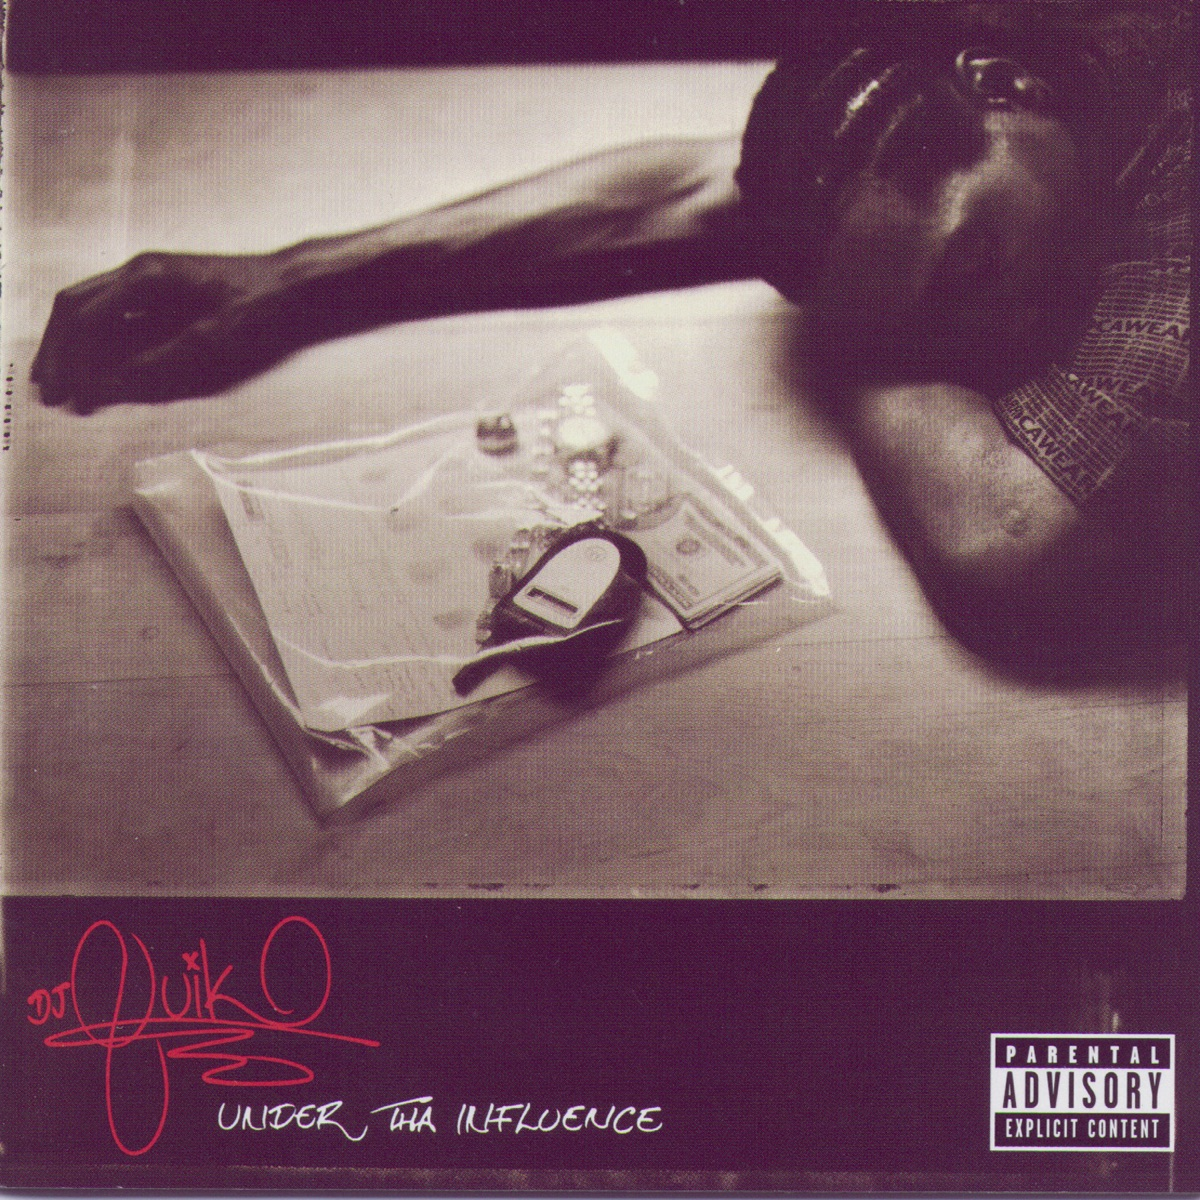 Under Tha Influence DJ Quik CD cover